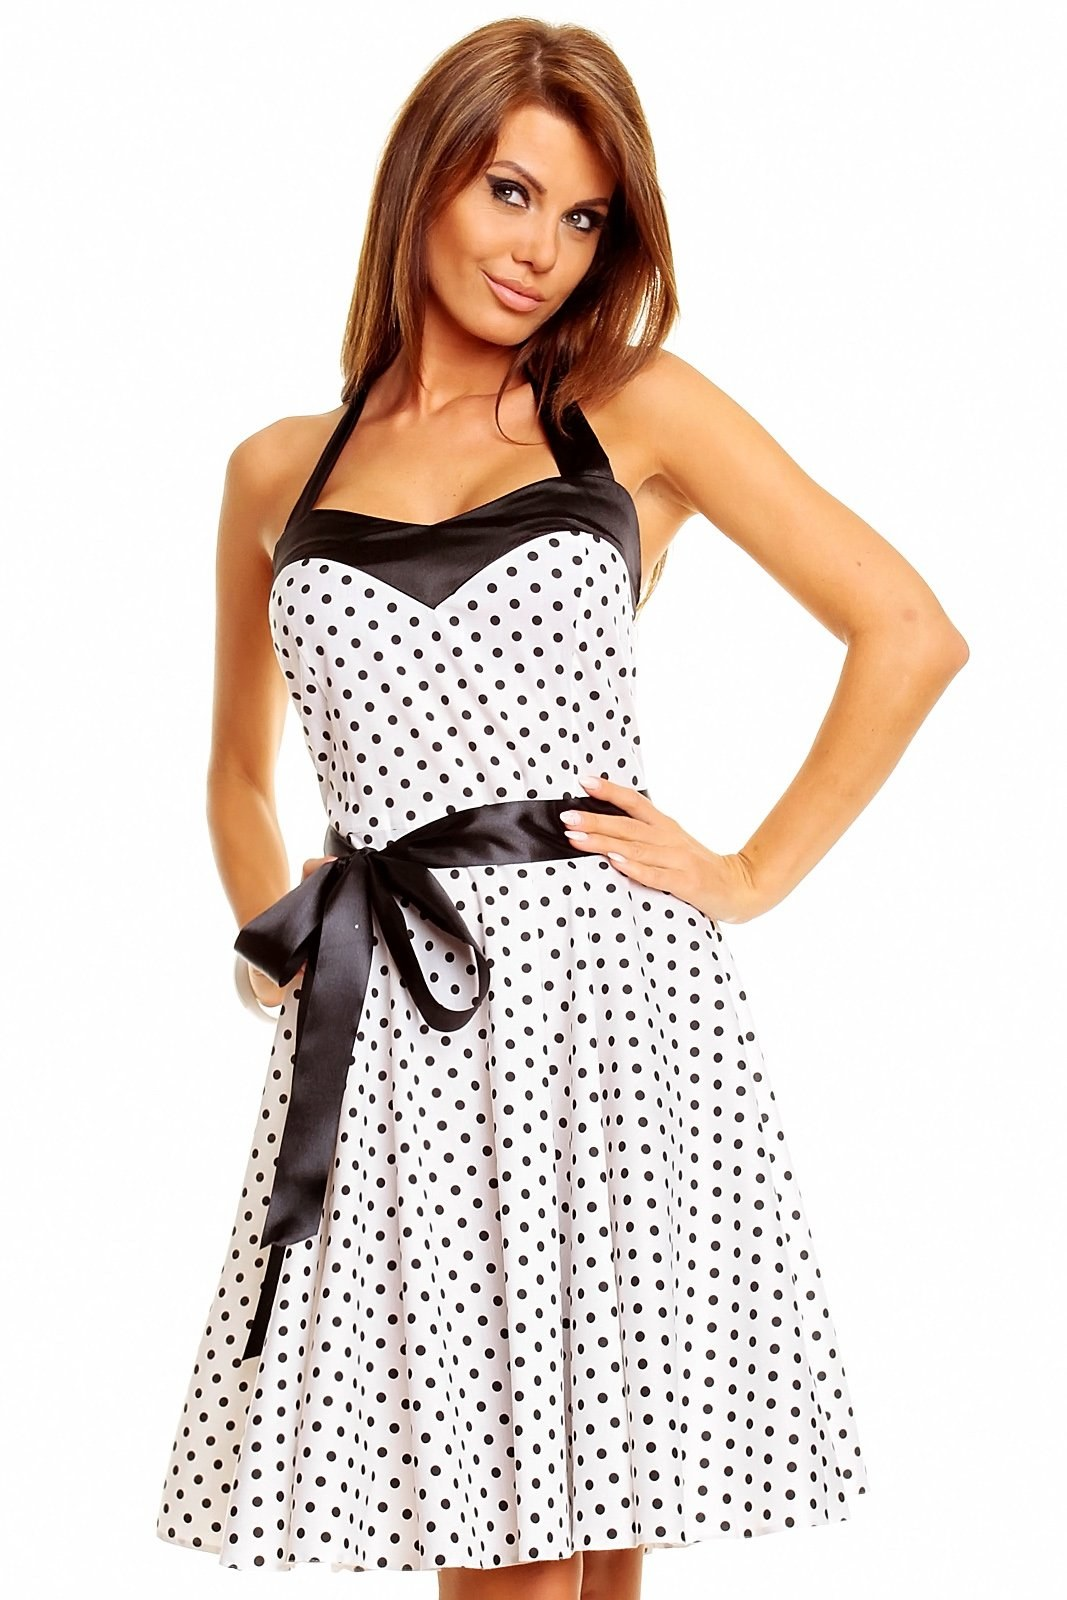 cf08a6f54cc2 Puntíkaté retro šaty ála Marilyn Monroe - Glami.cz